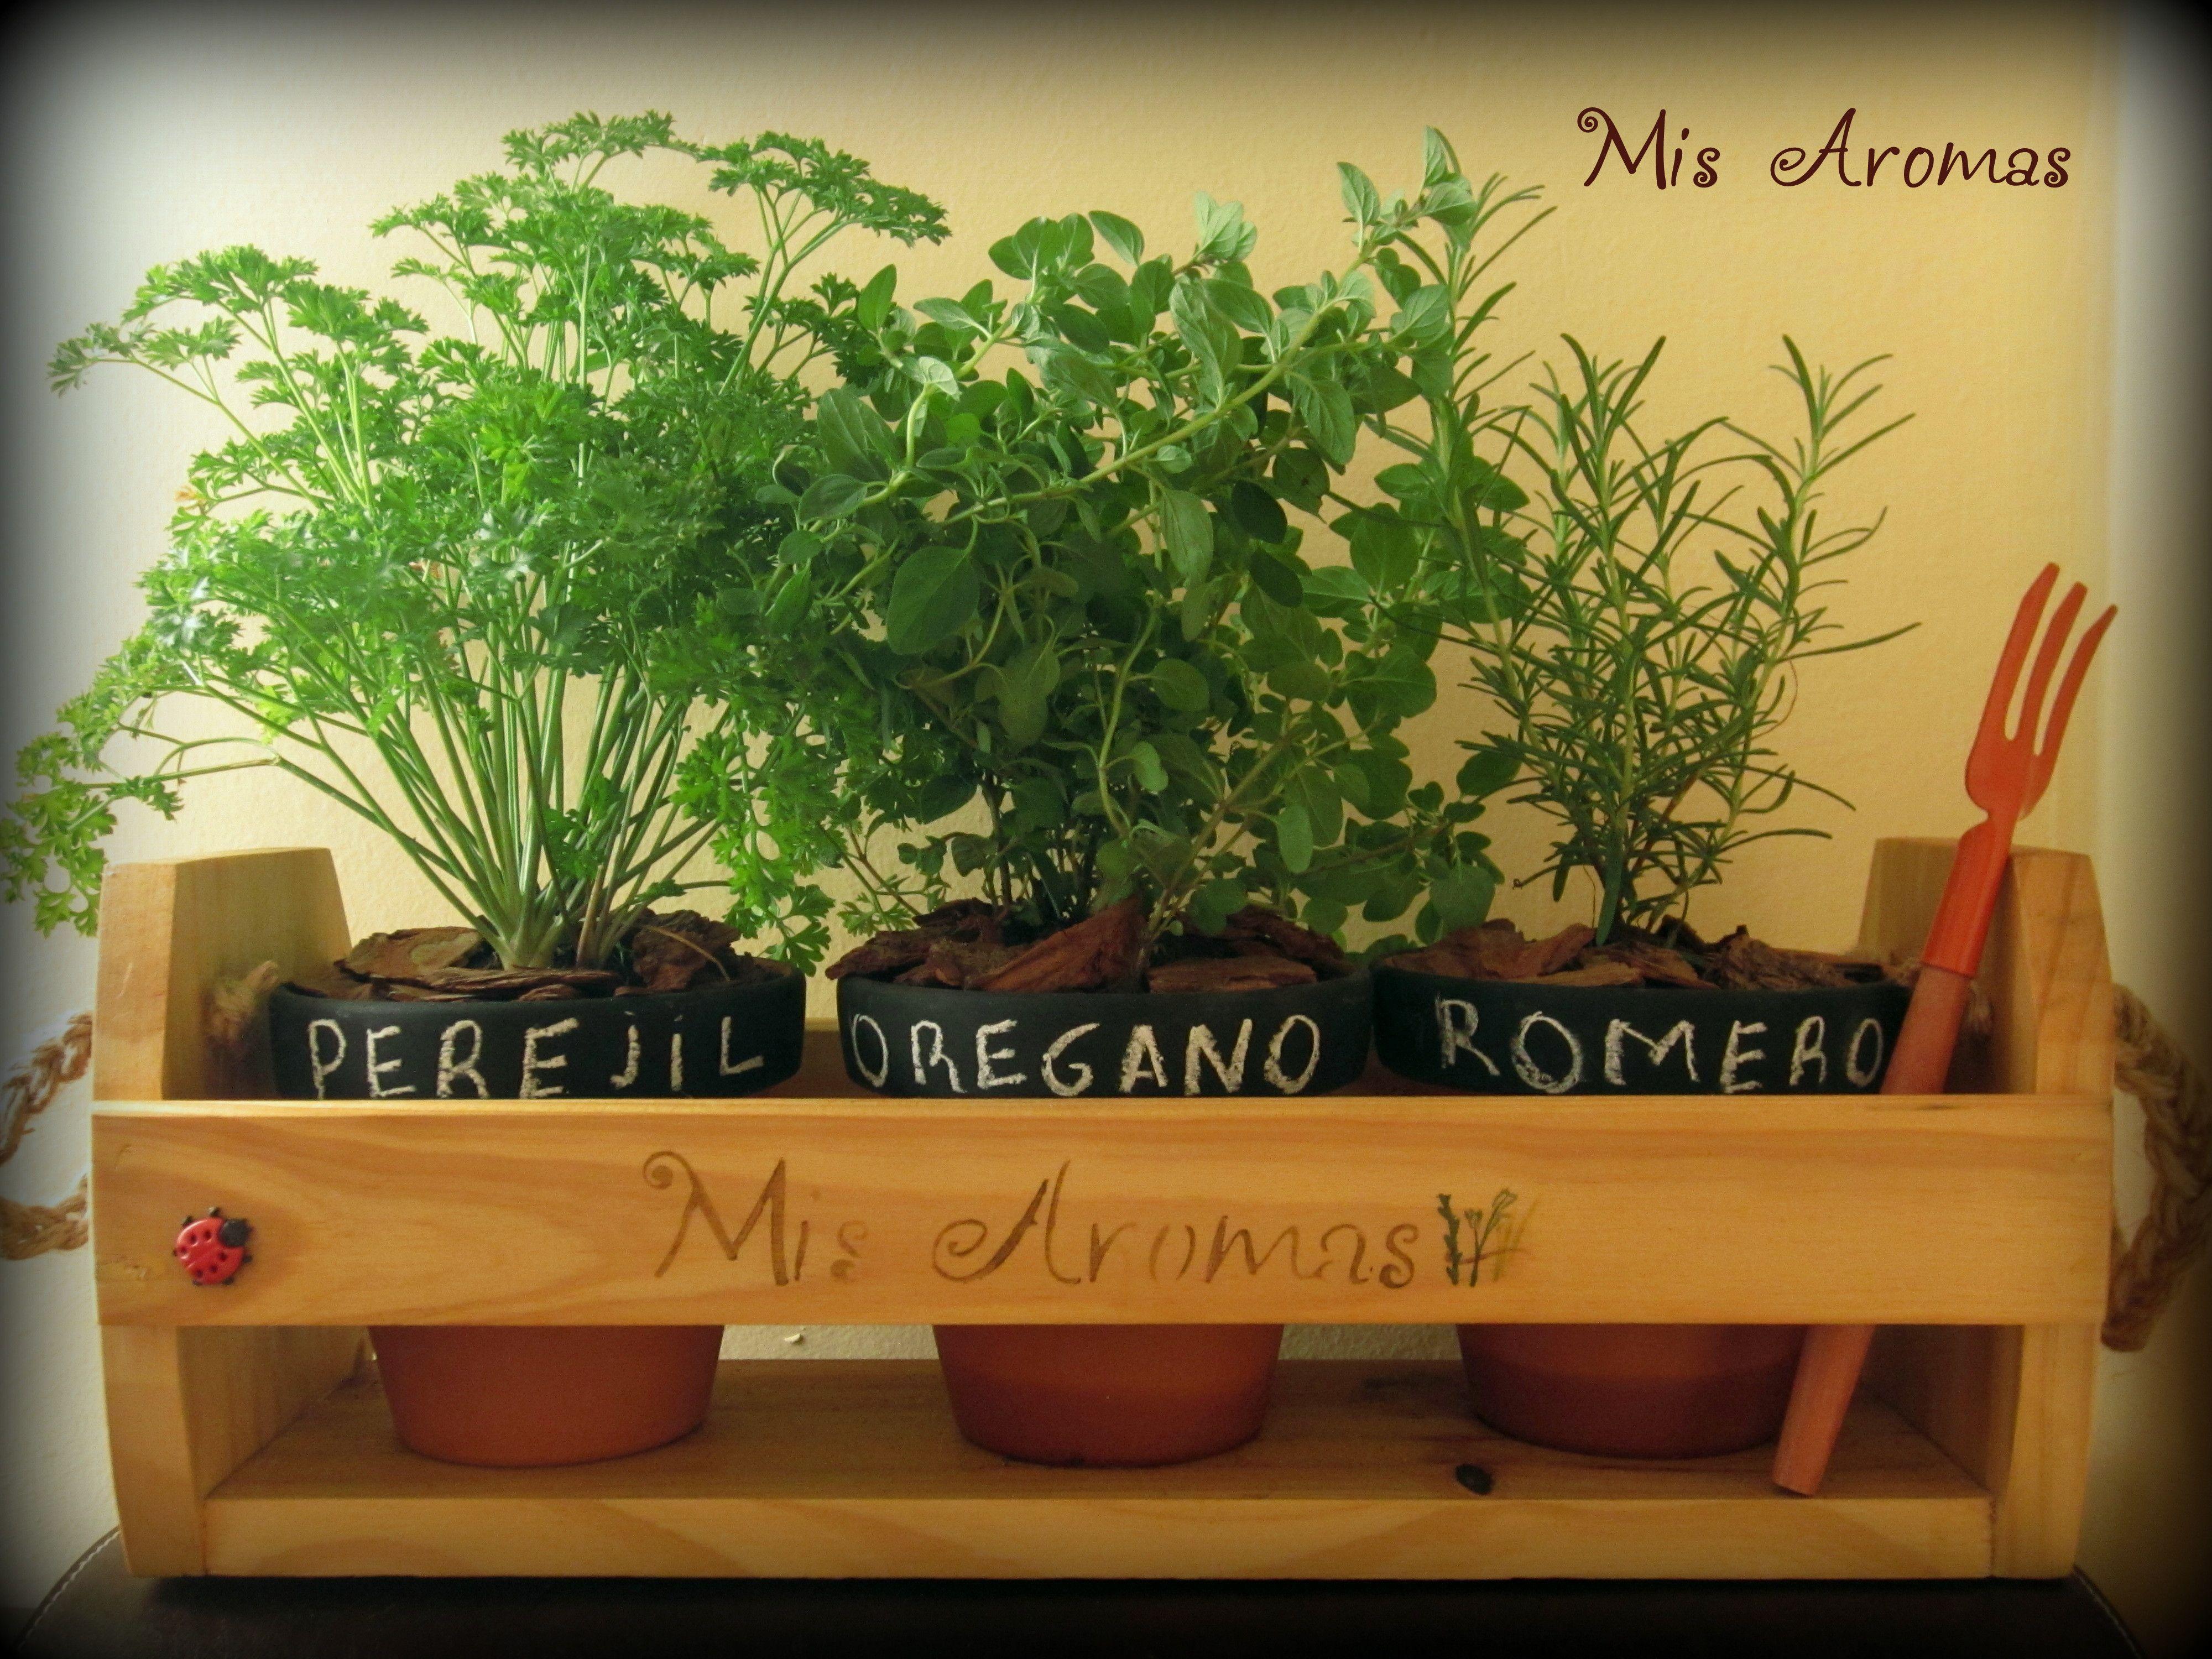 Kit de especies arom ticas incluye 1 porta macetero de for Huerta de aromaticas en macetas